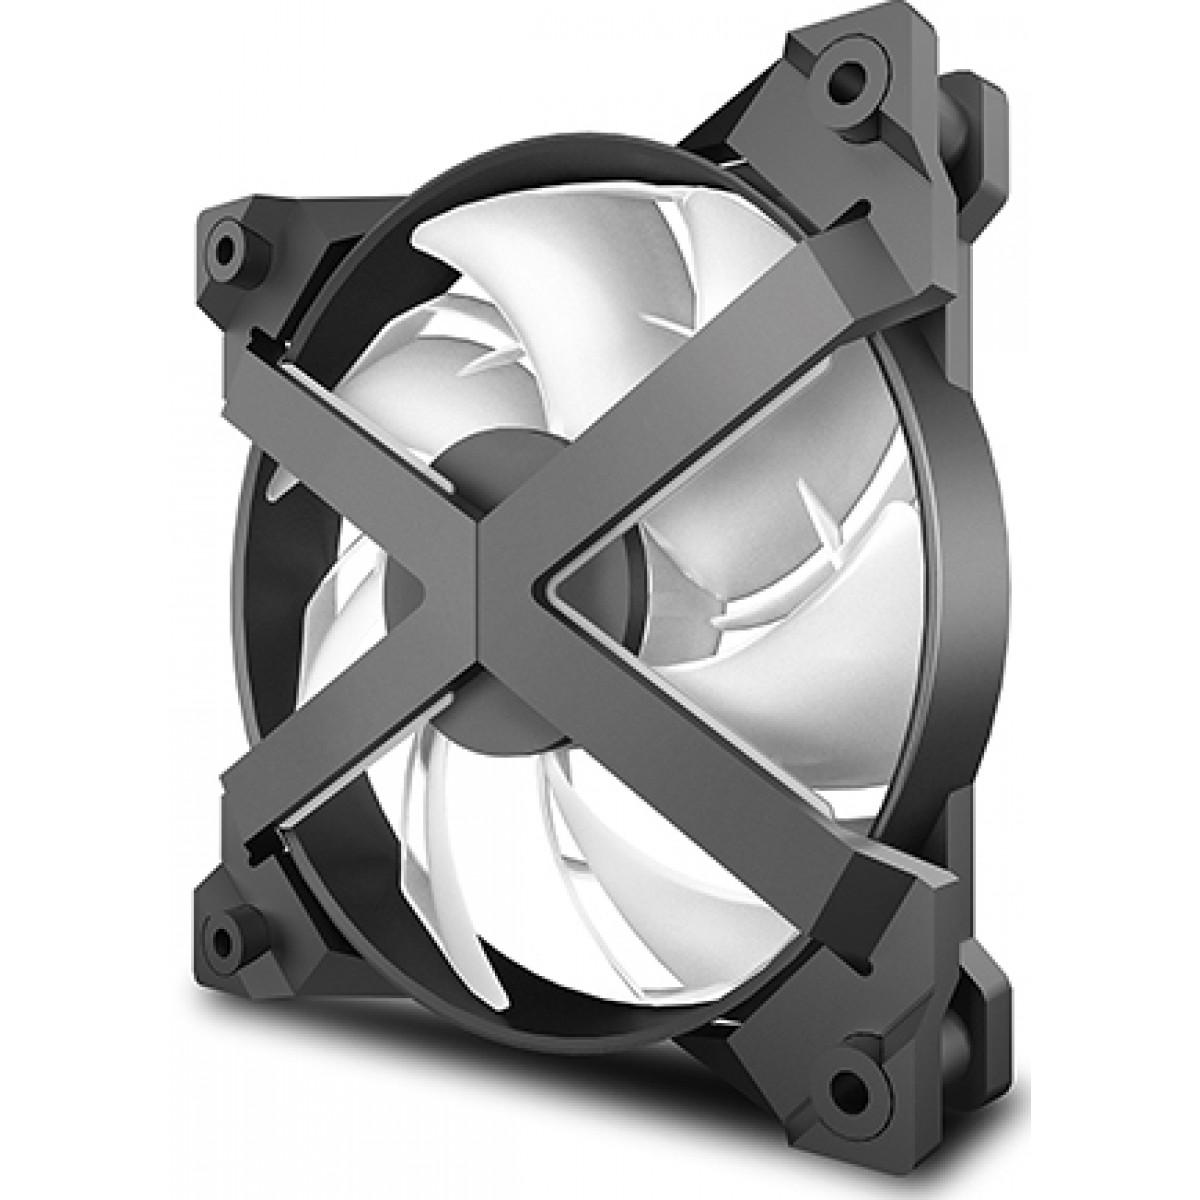 Kit Fan com 3 Unidades Deepcool, MF120 GT, RGB, Controladora, 120mm, Hidráulico, 1800RPM, DP-GS-F12-AR-MF120GT-3P